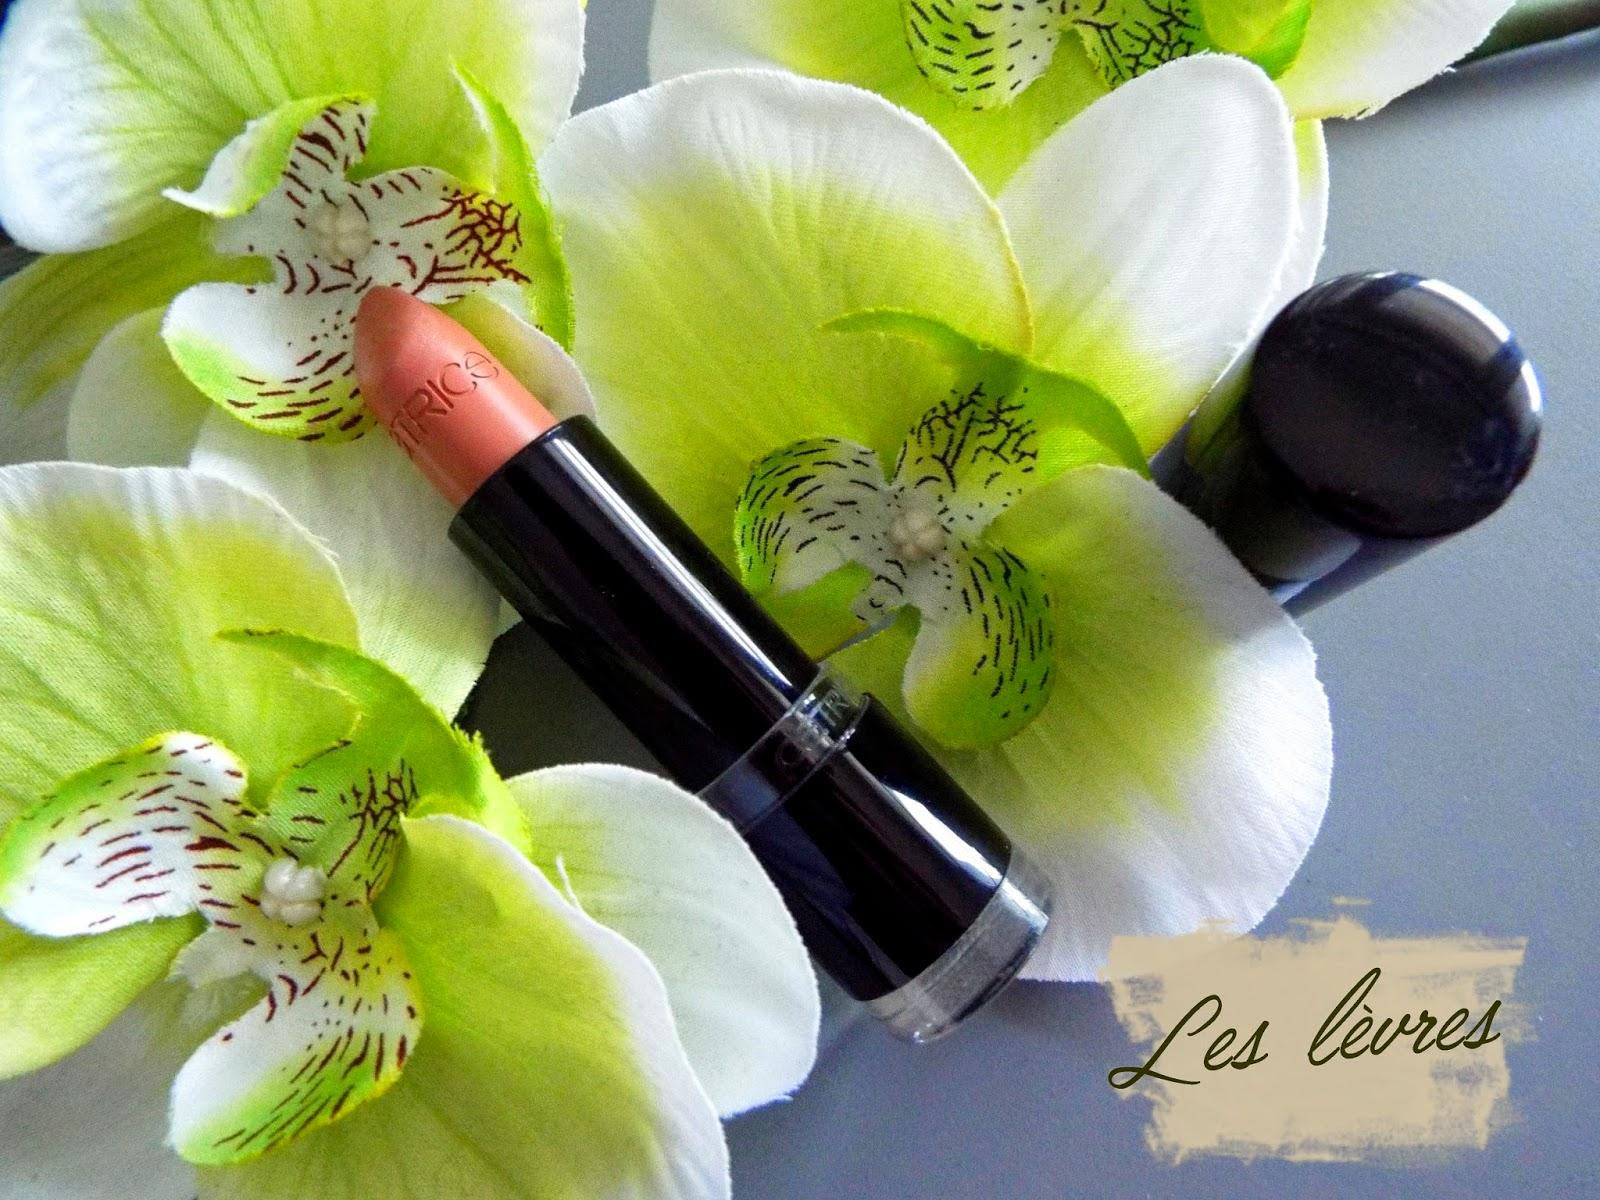 La maquillage vert et or de la mariée Orientale